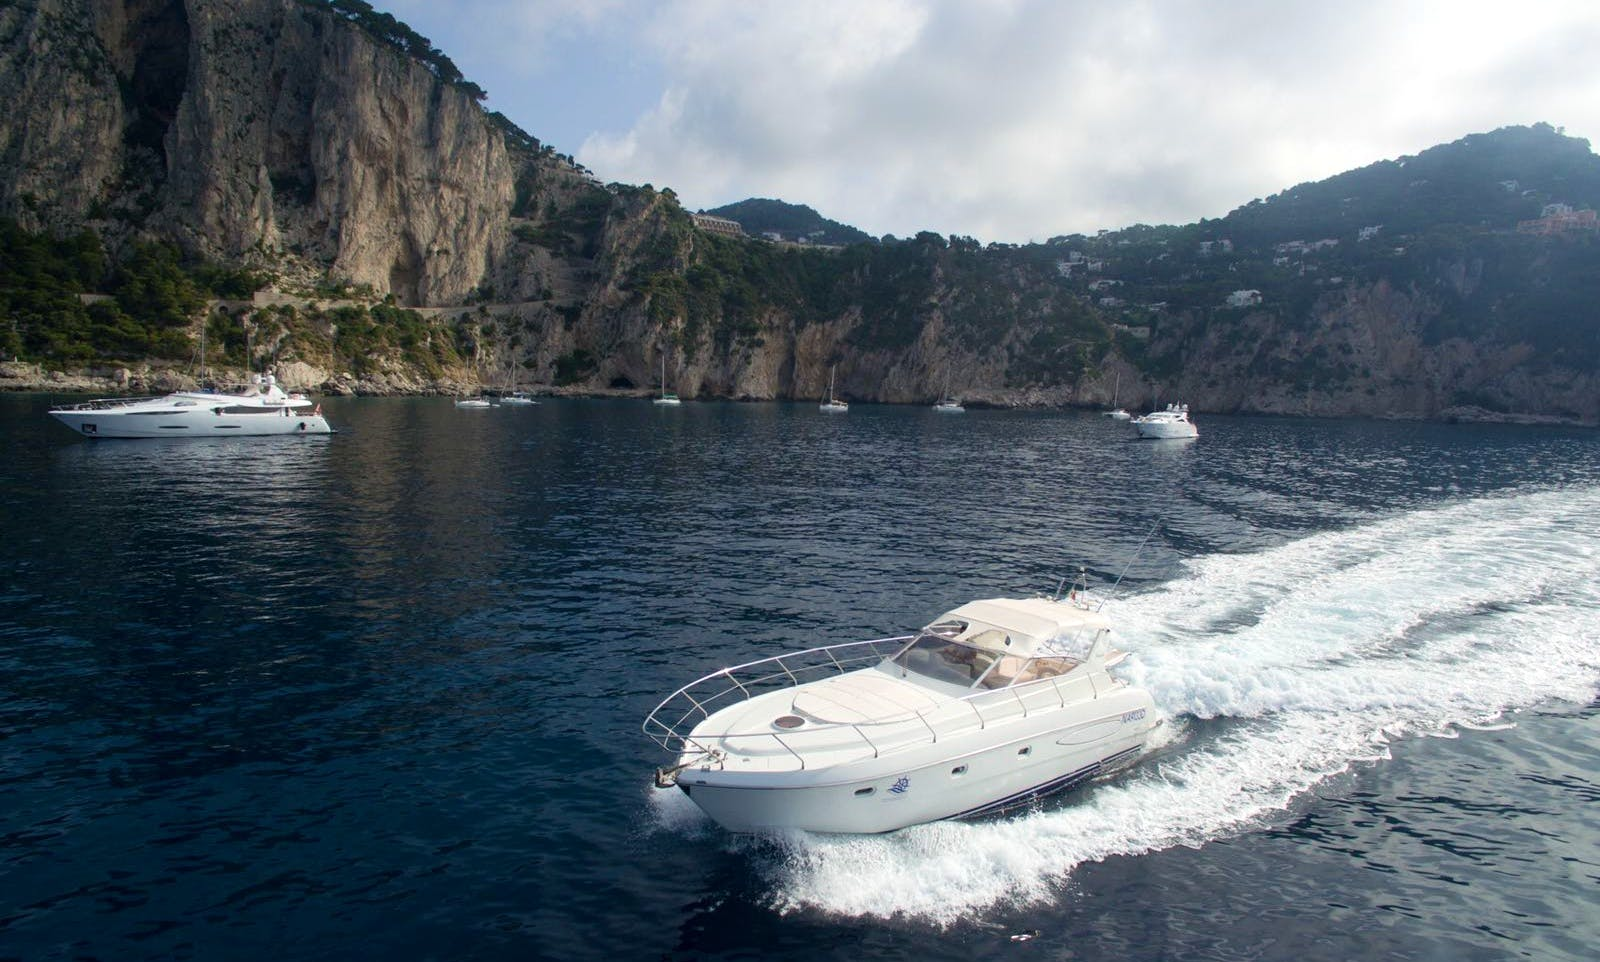 Raffaelli Shamal 40 Motor Yacht in Sorrento, Italy